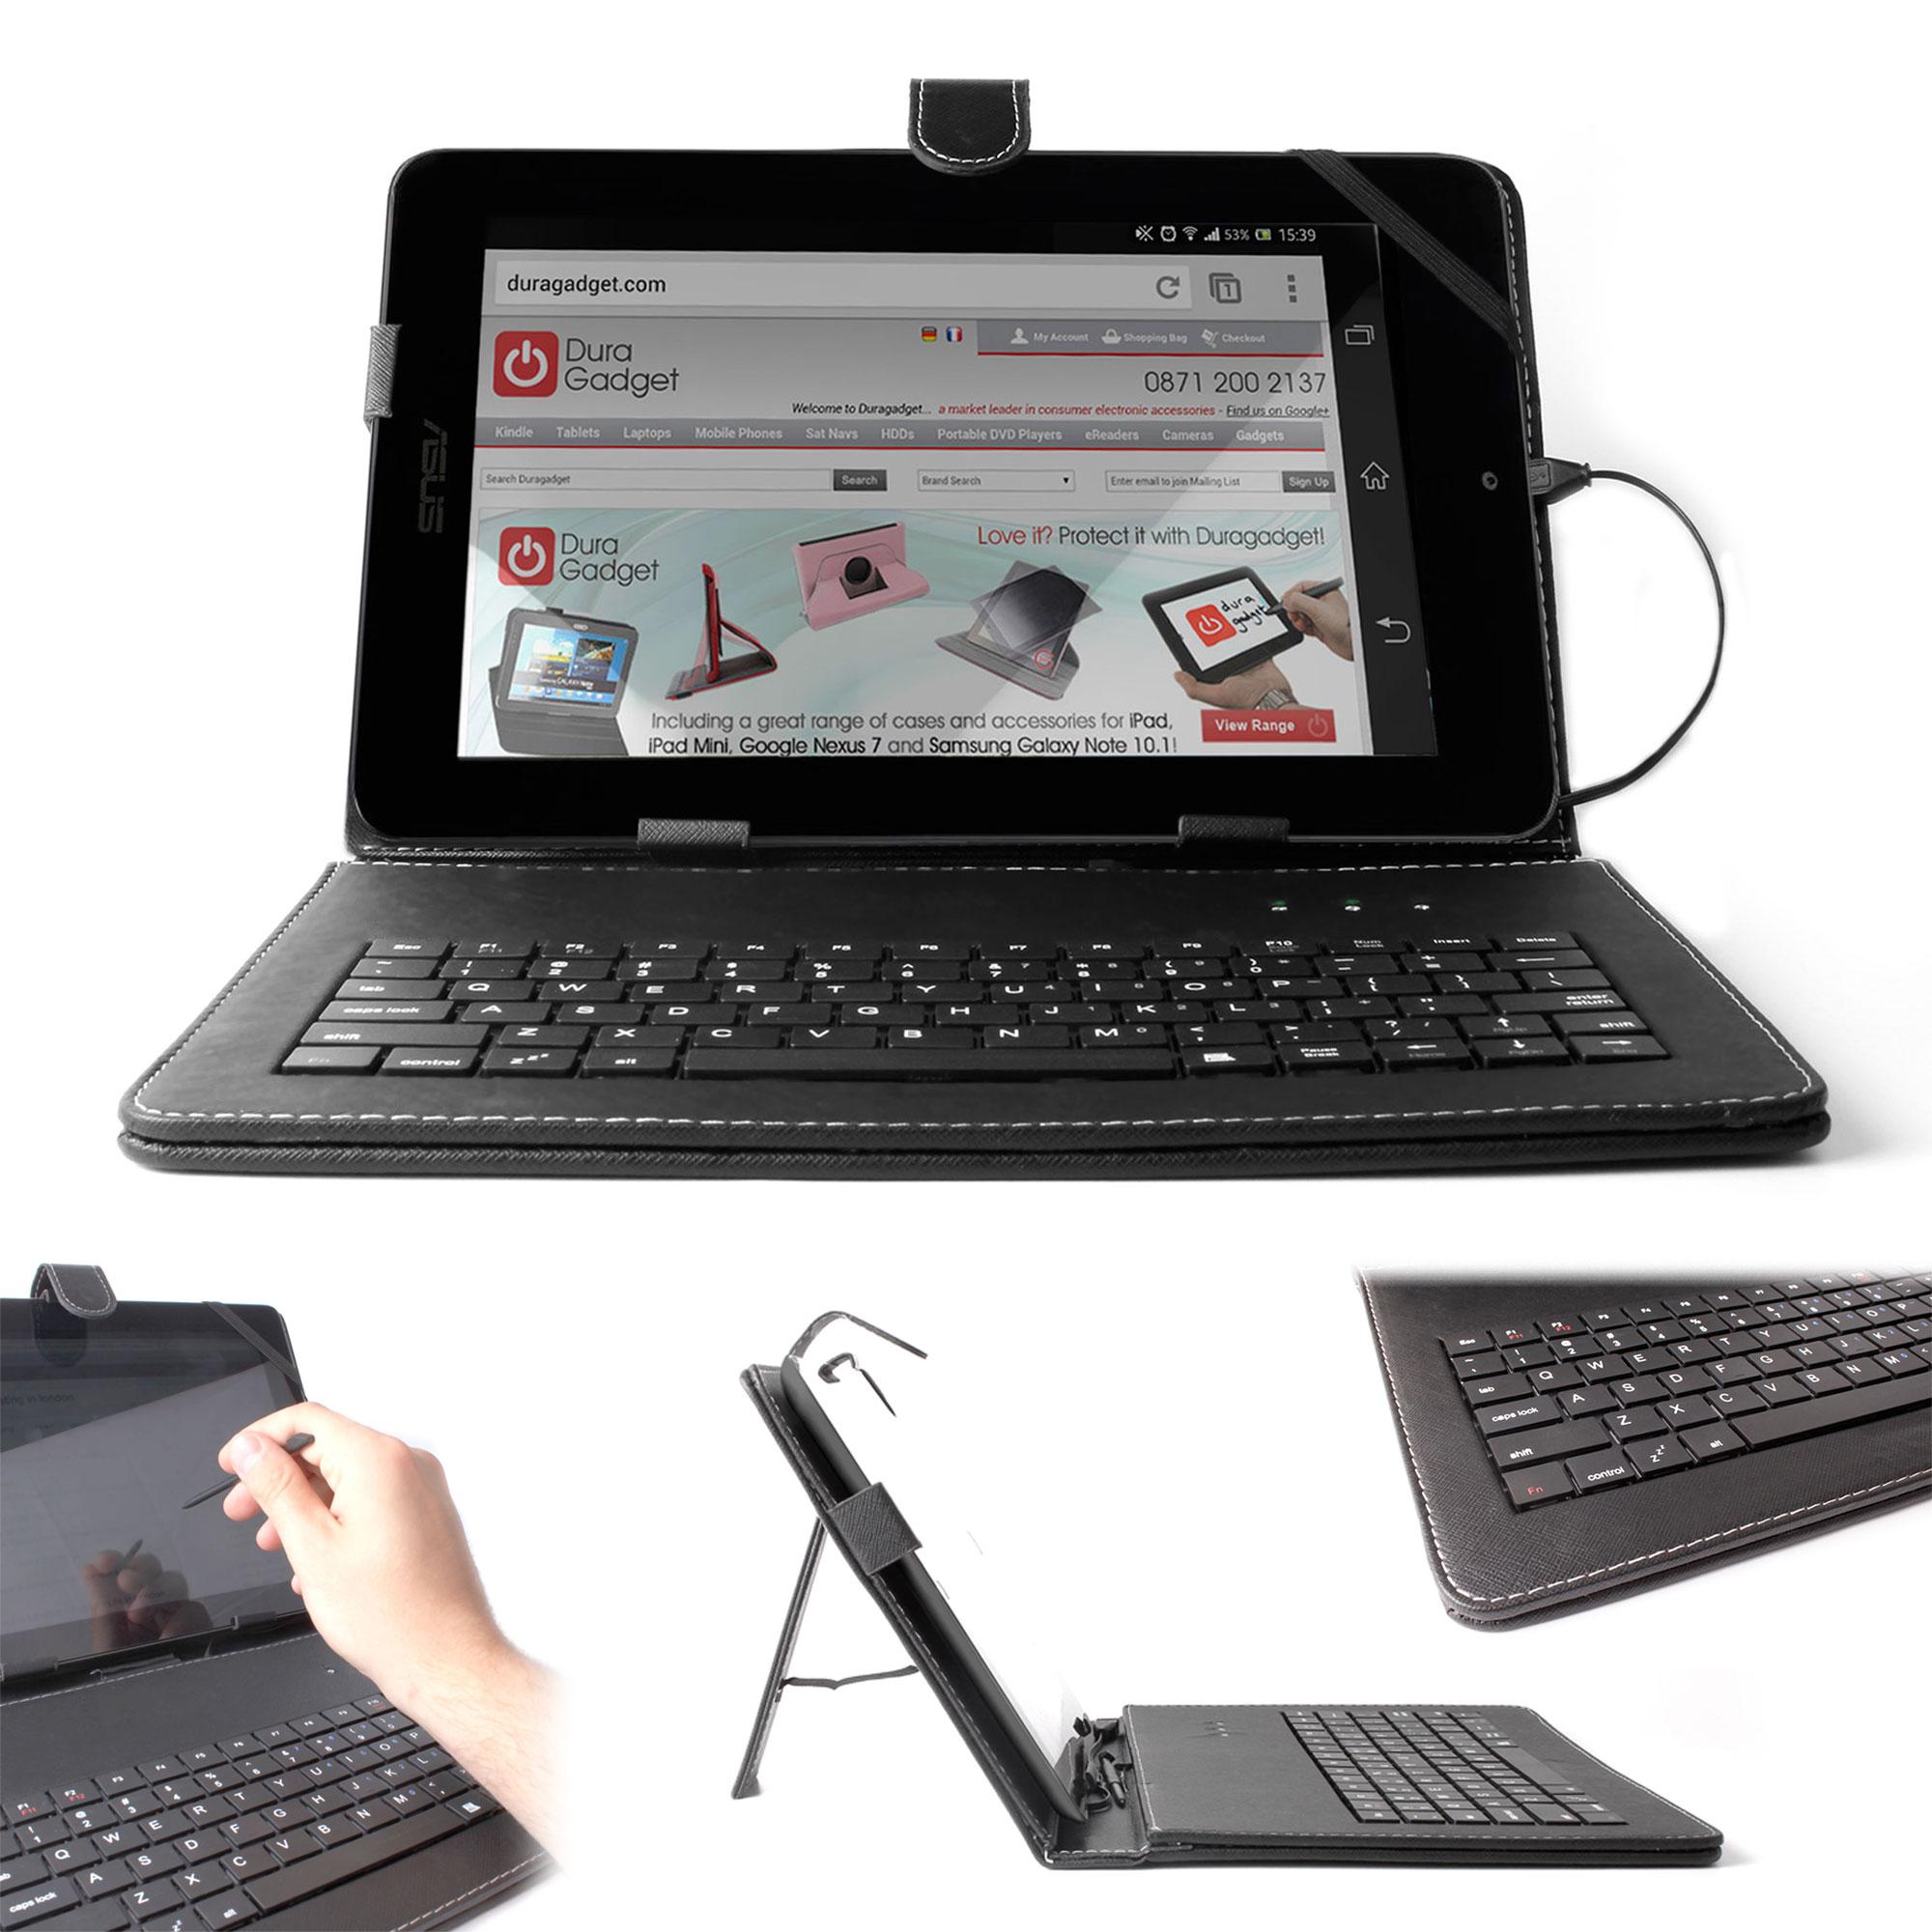 etui clavier int gr pour tablette asus eee pad transformer tg101 stylet. Black Bedroom Furniture Sets. Home Design Ideas